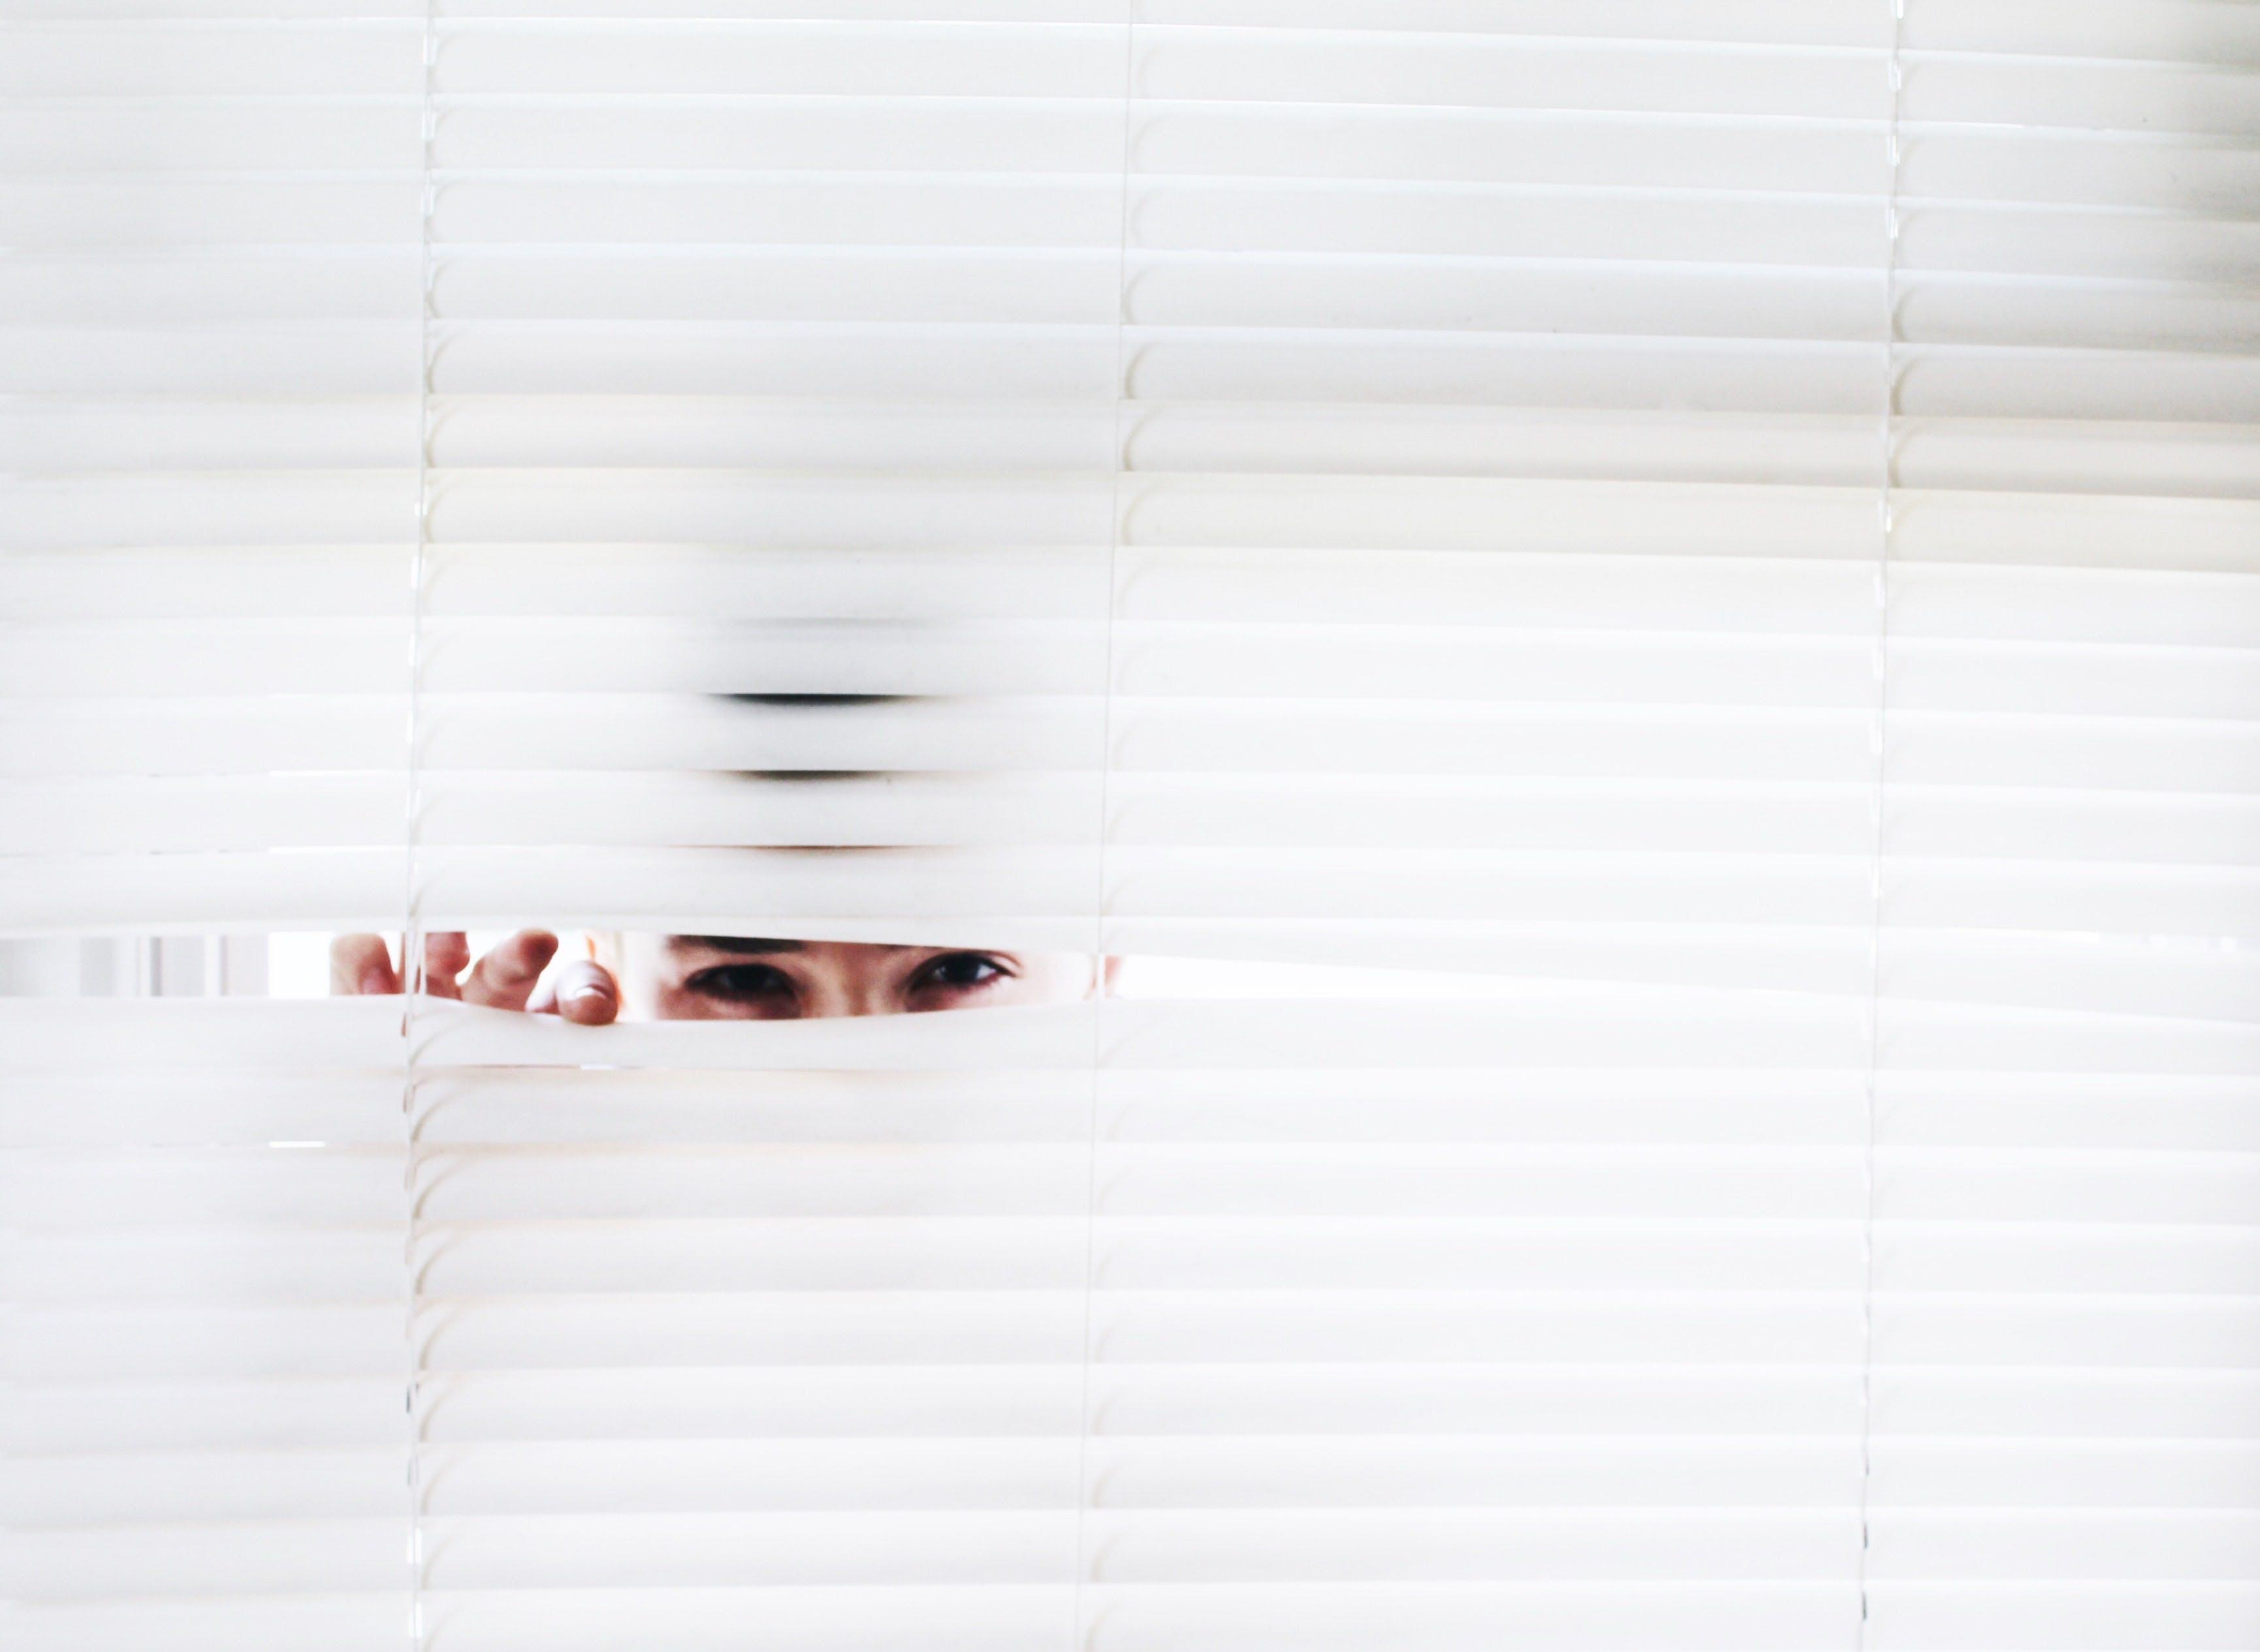 woman peeking out of blinds